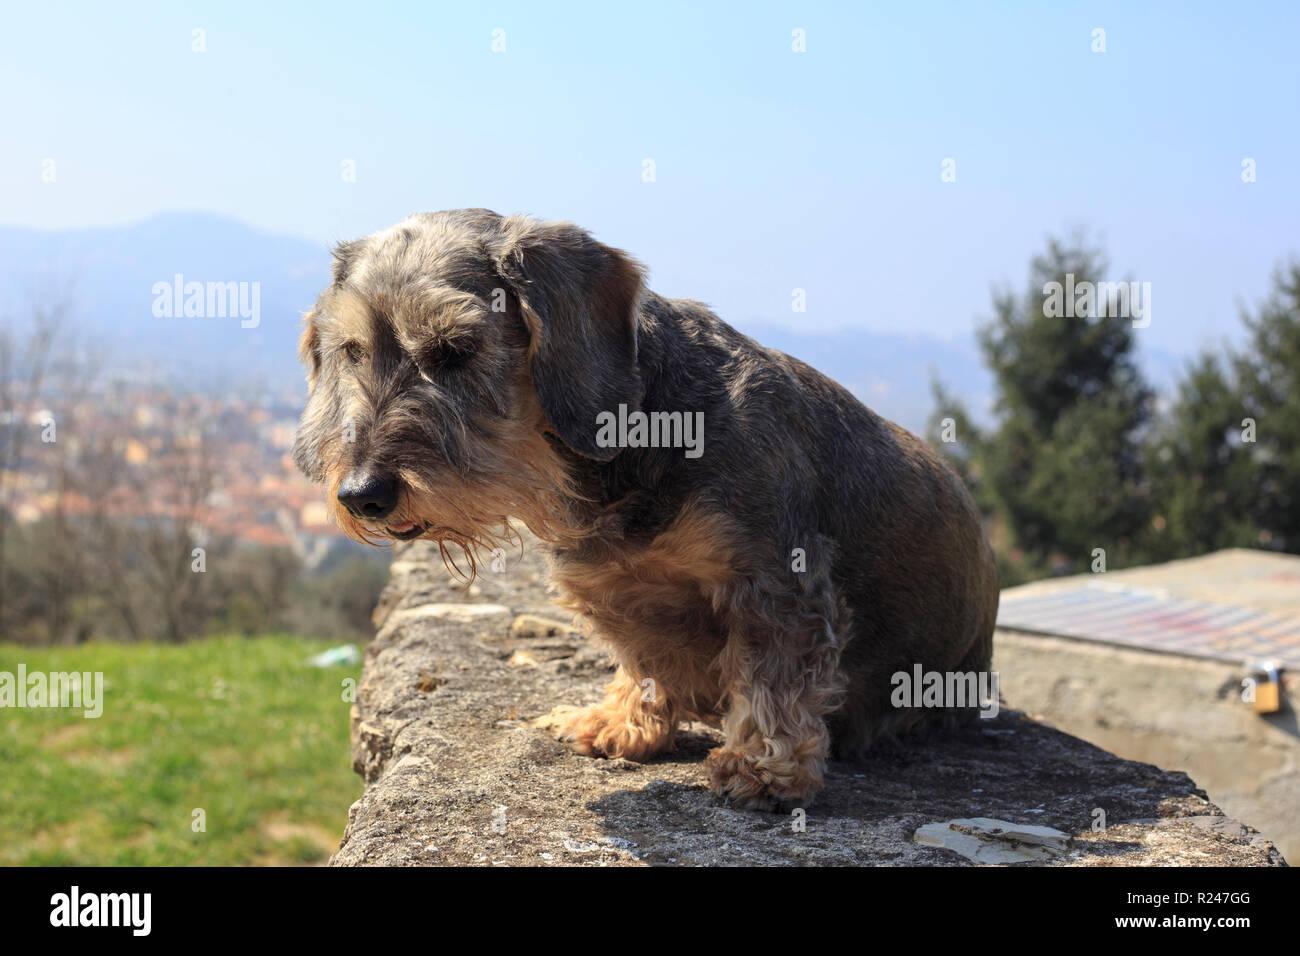 Miniature Dachshund - Stock Image